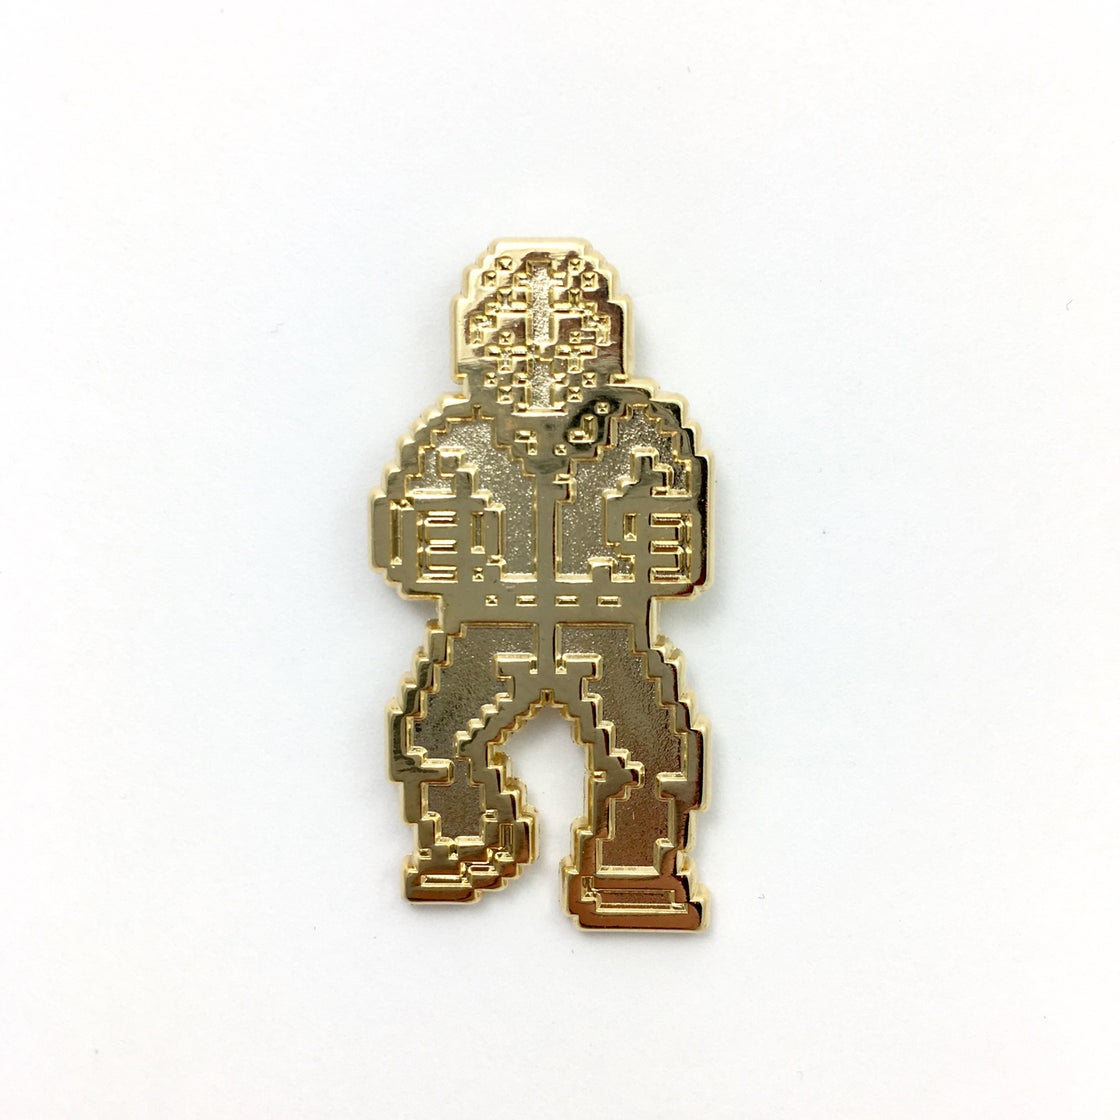 Image of 8-Bit Jason (Gold Edition)